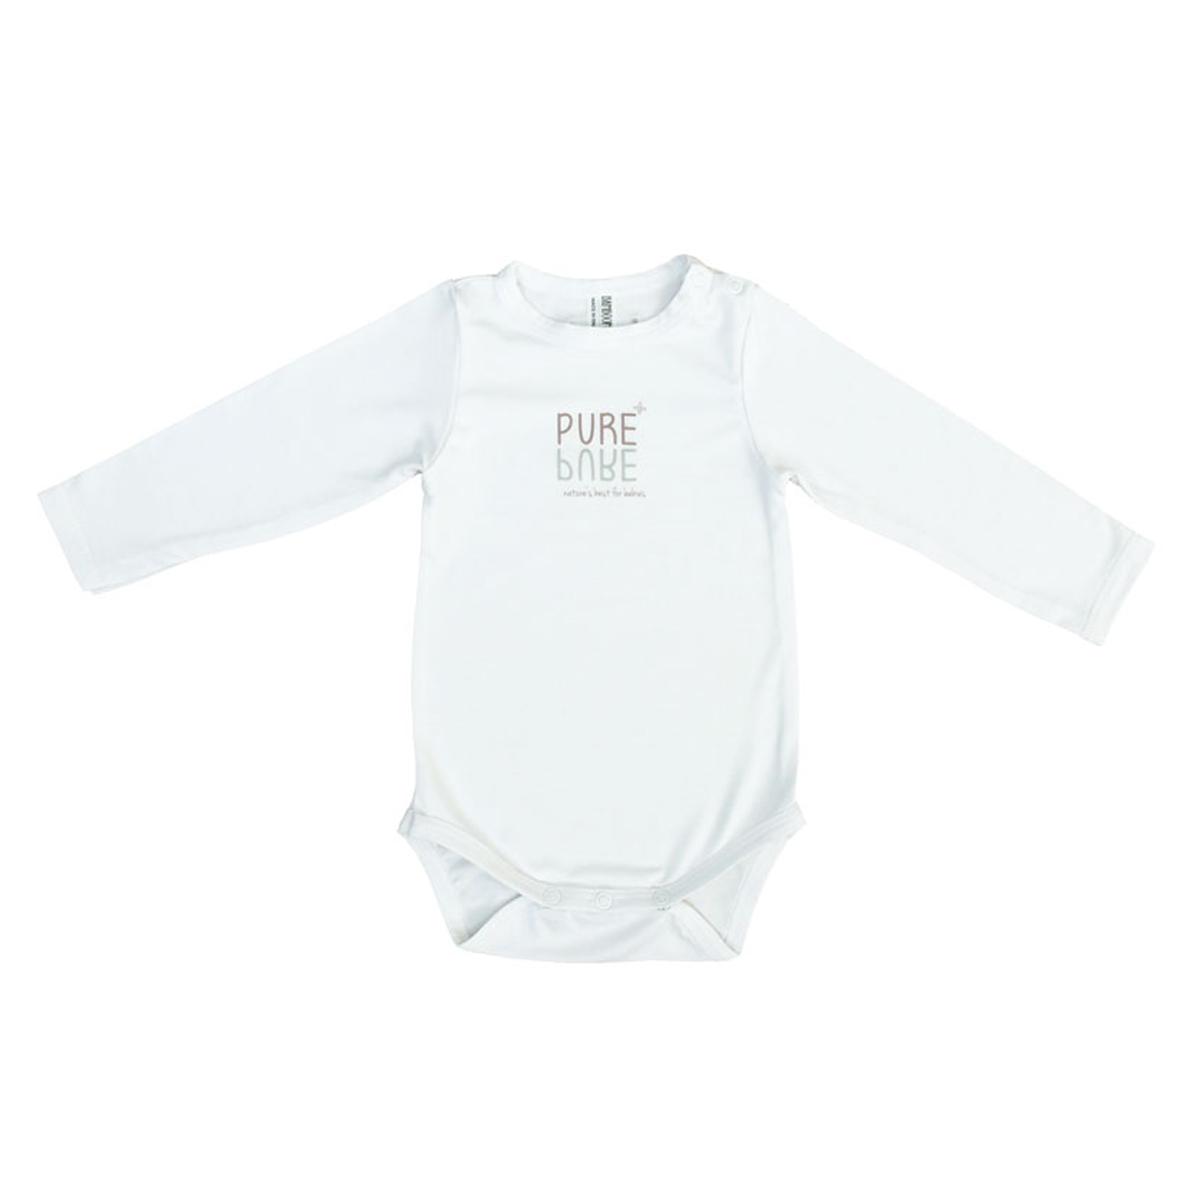 Body & Pyjama Body Manches Longues Blanc - 12/18 Mois Body Manches Longues Blanc - 12/18 Mois